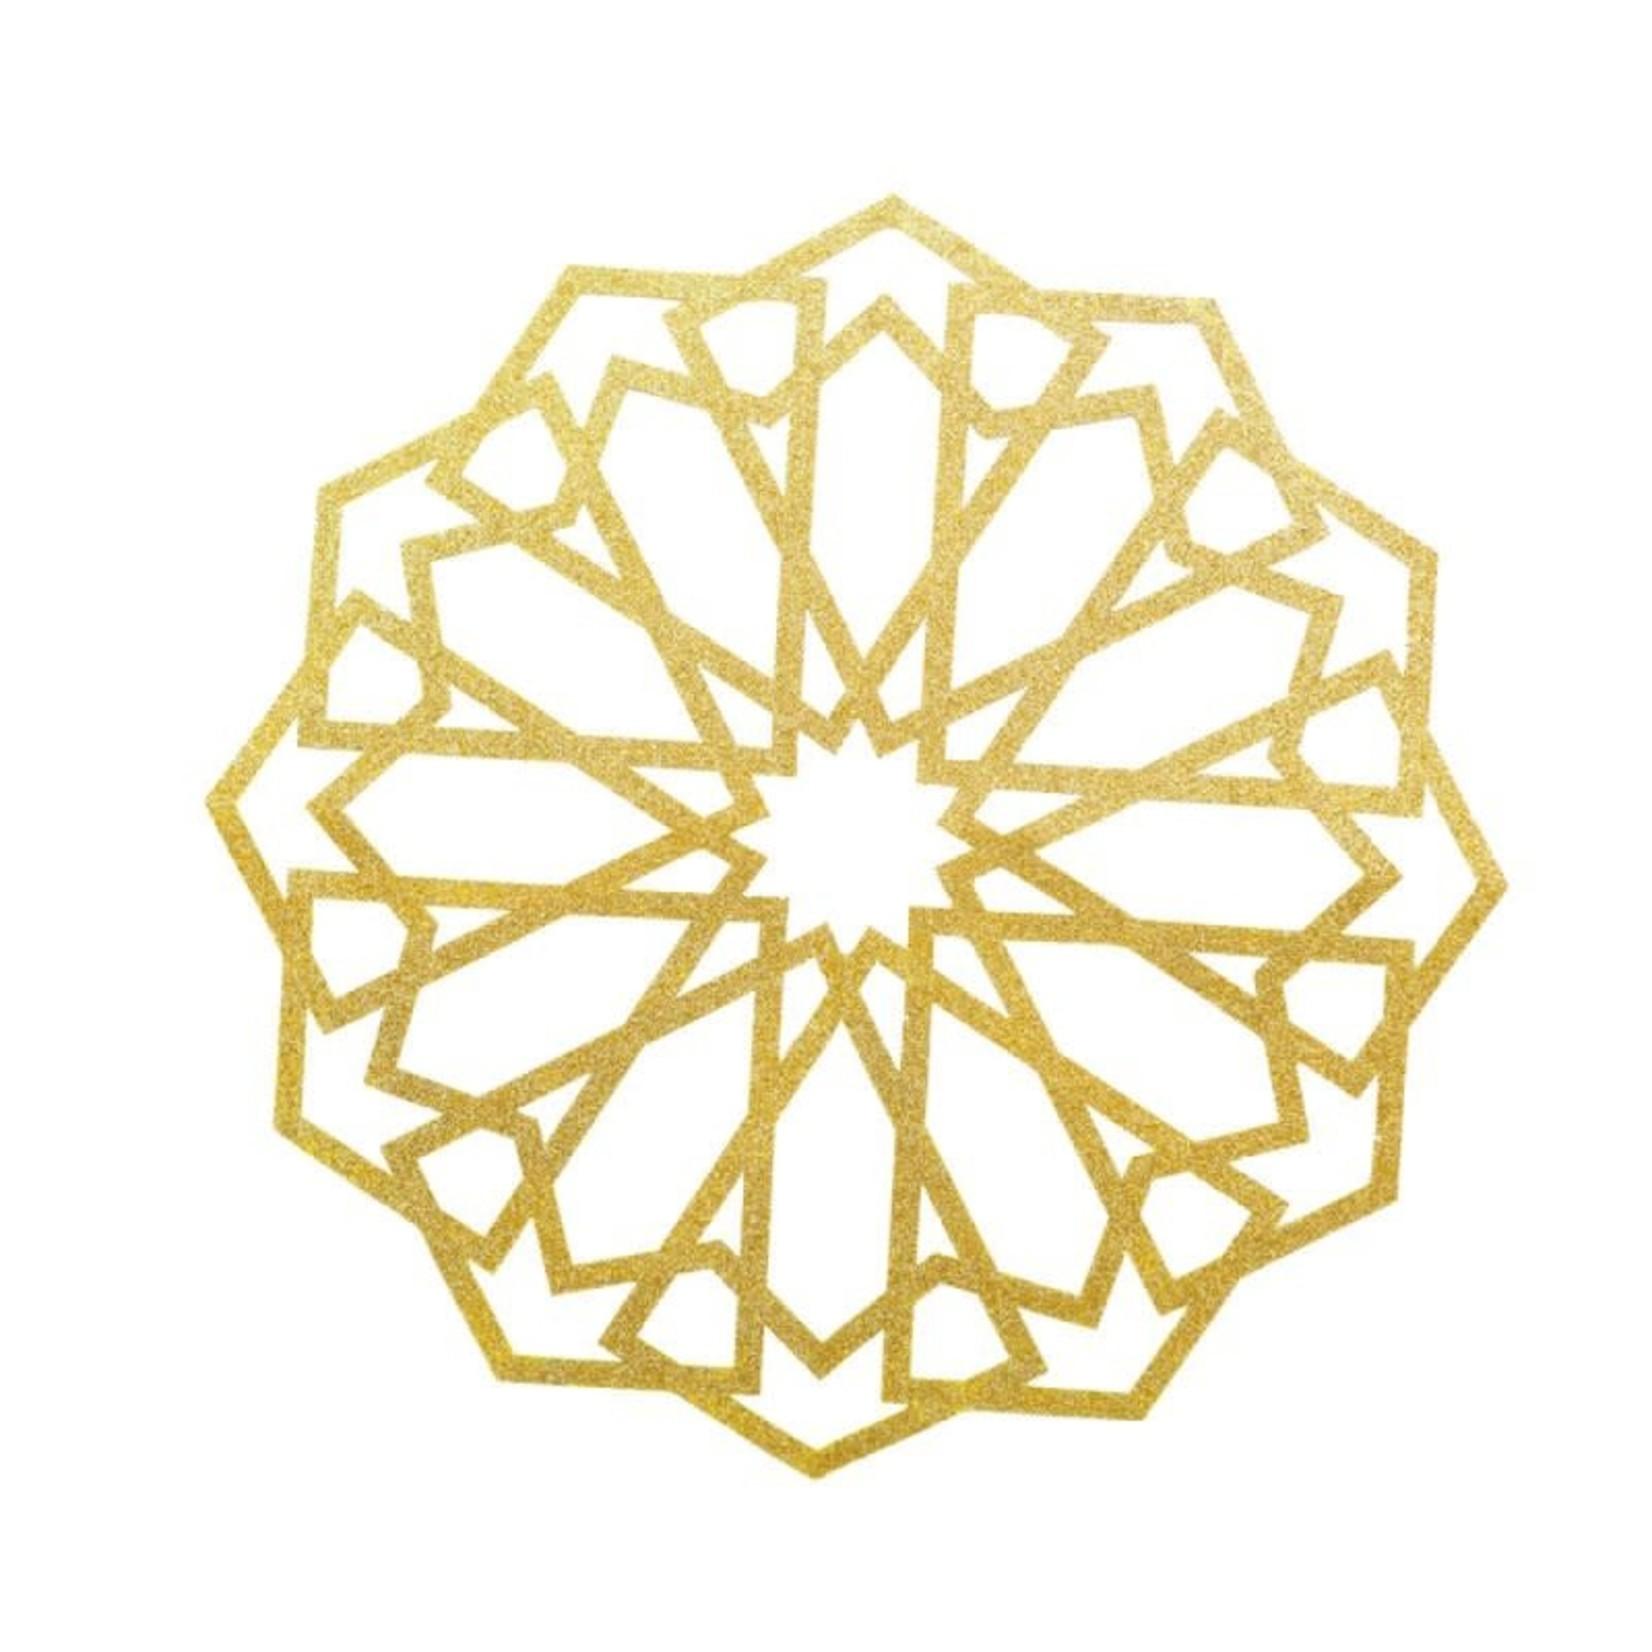 Eid Creations Marrakesh Gold Wall Decal